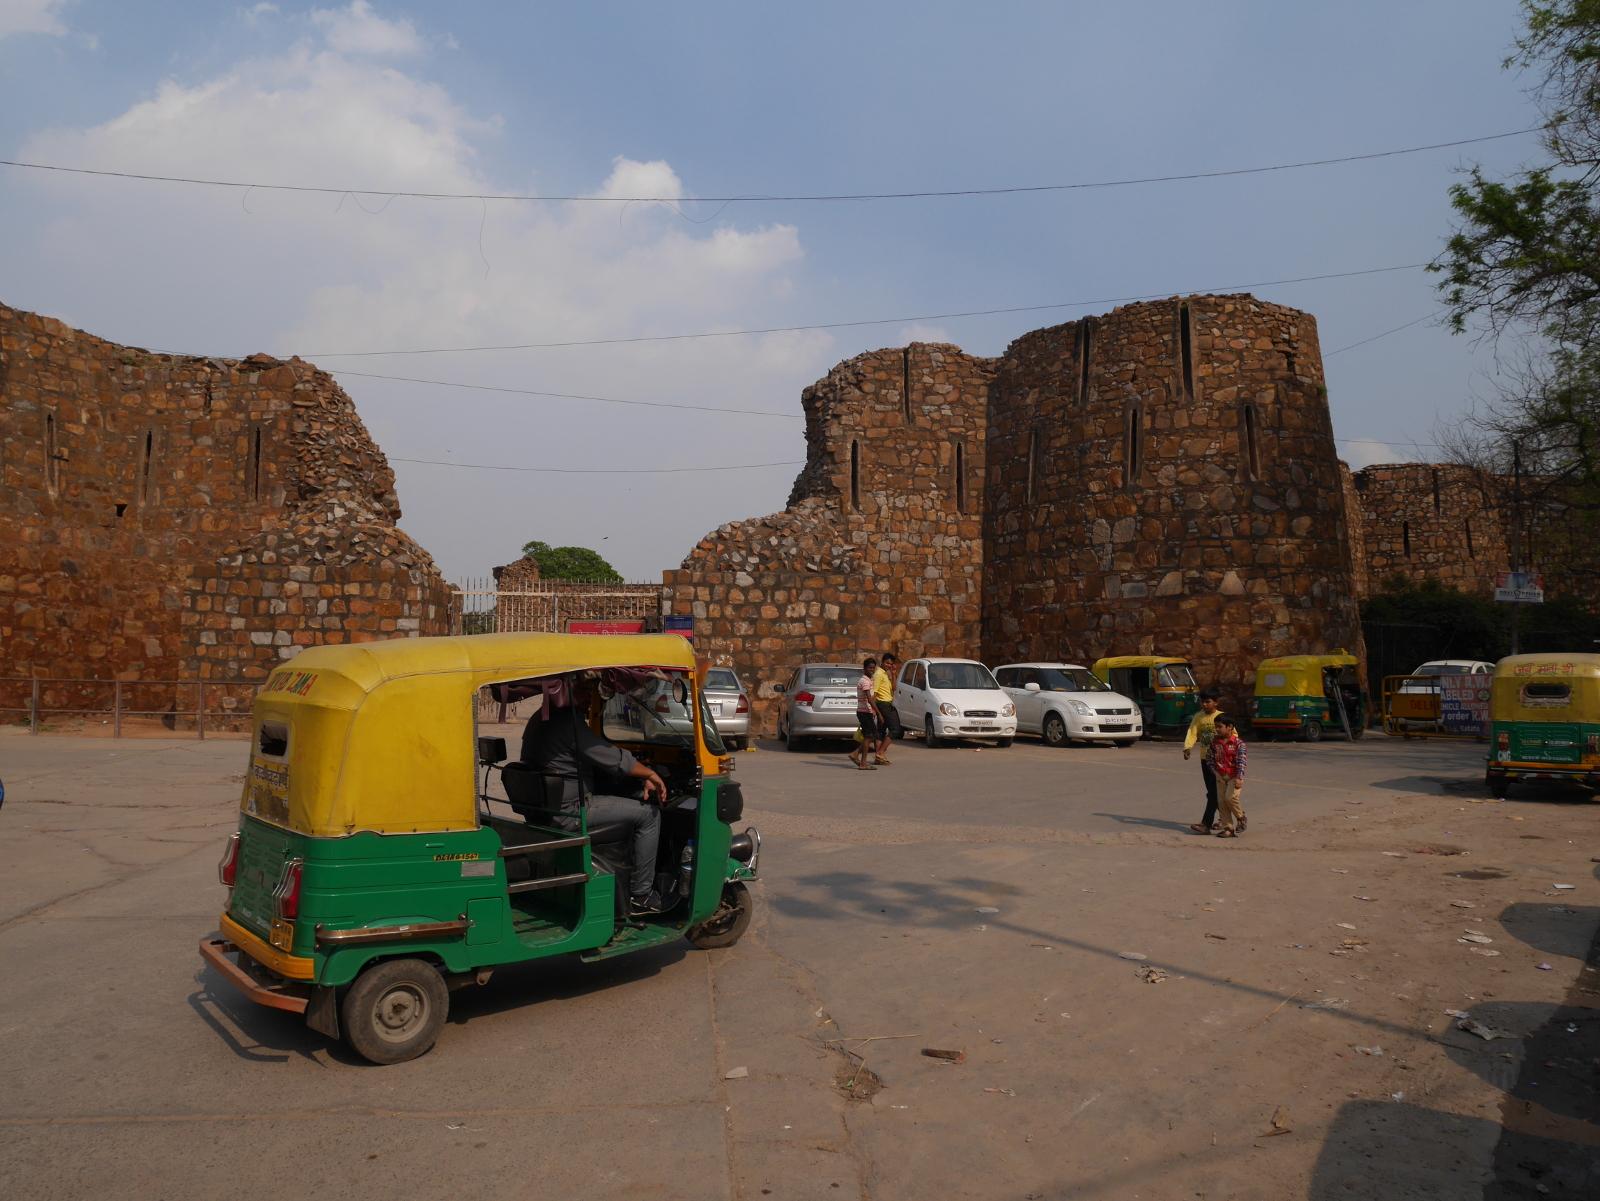 A Bajaj autorickshaw at Firoz Shah Kotla, Delhi.